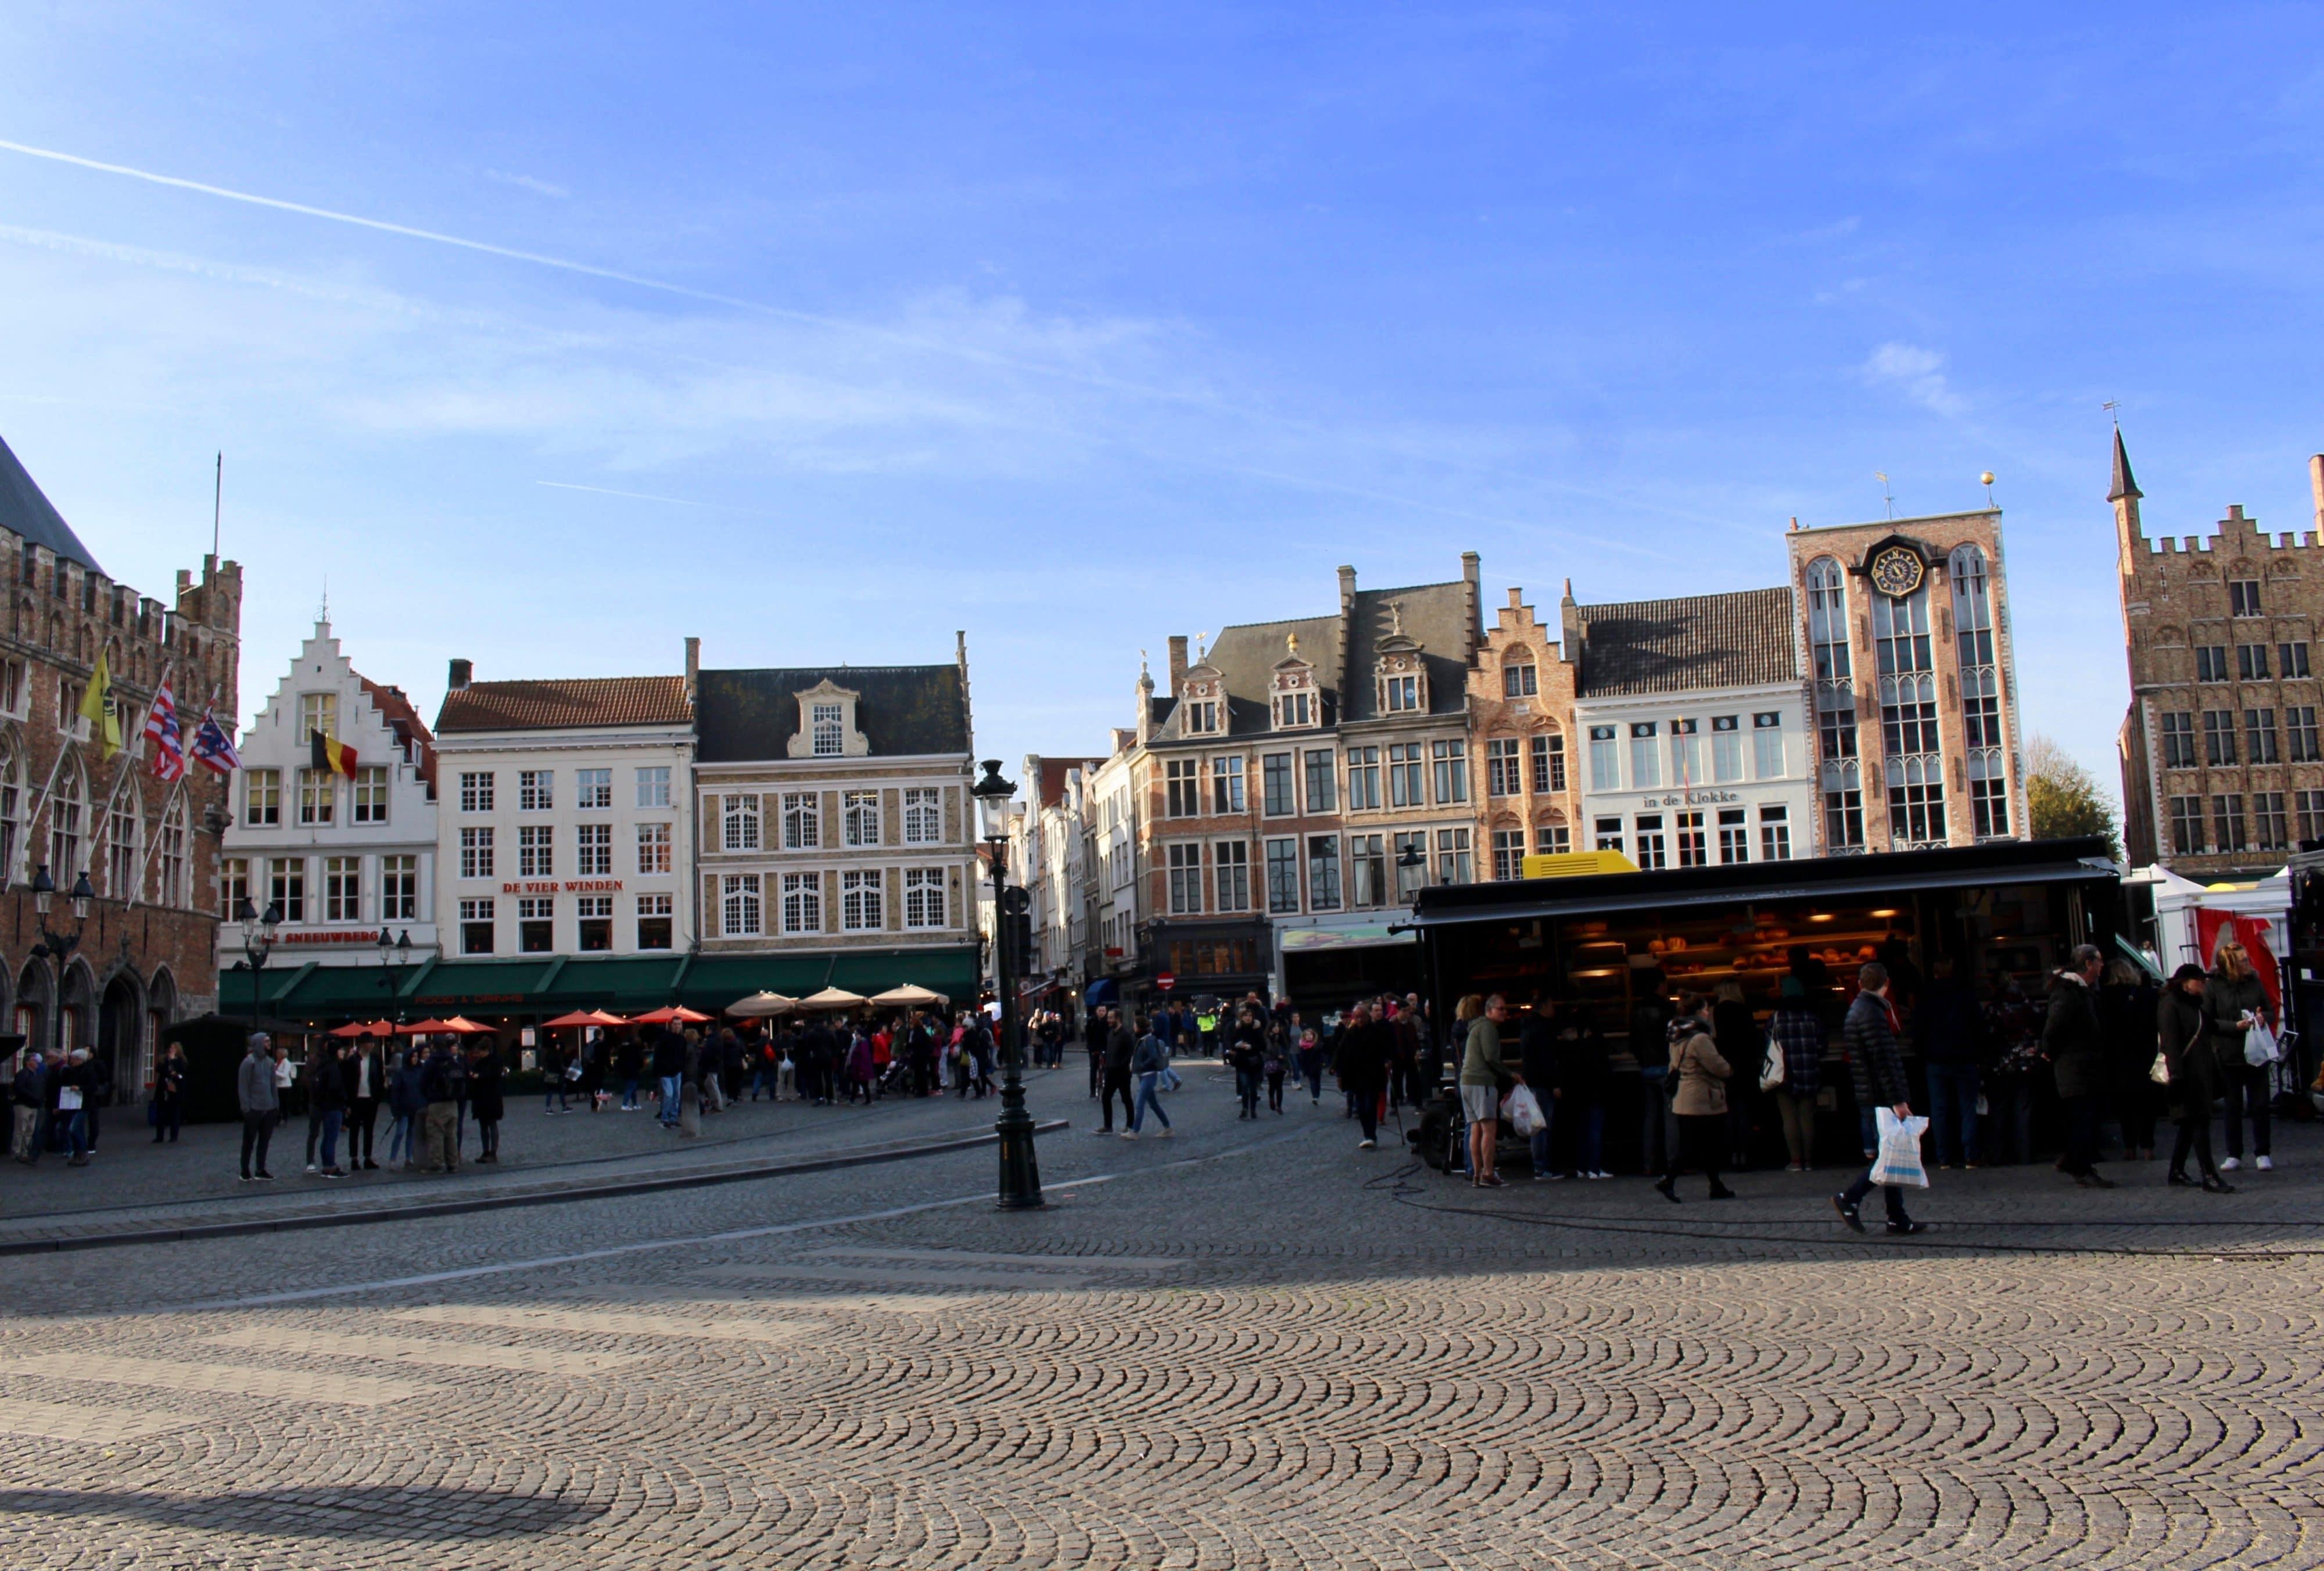 visiter bruges en une journee : la place du markt